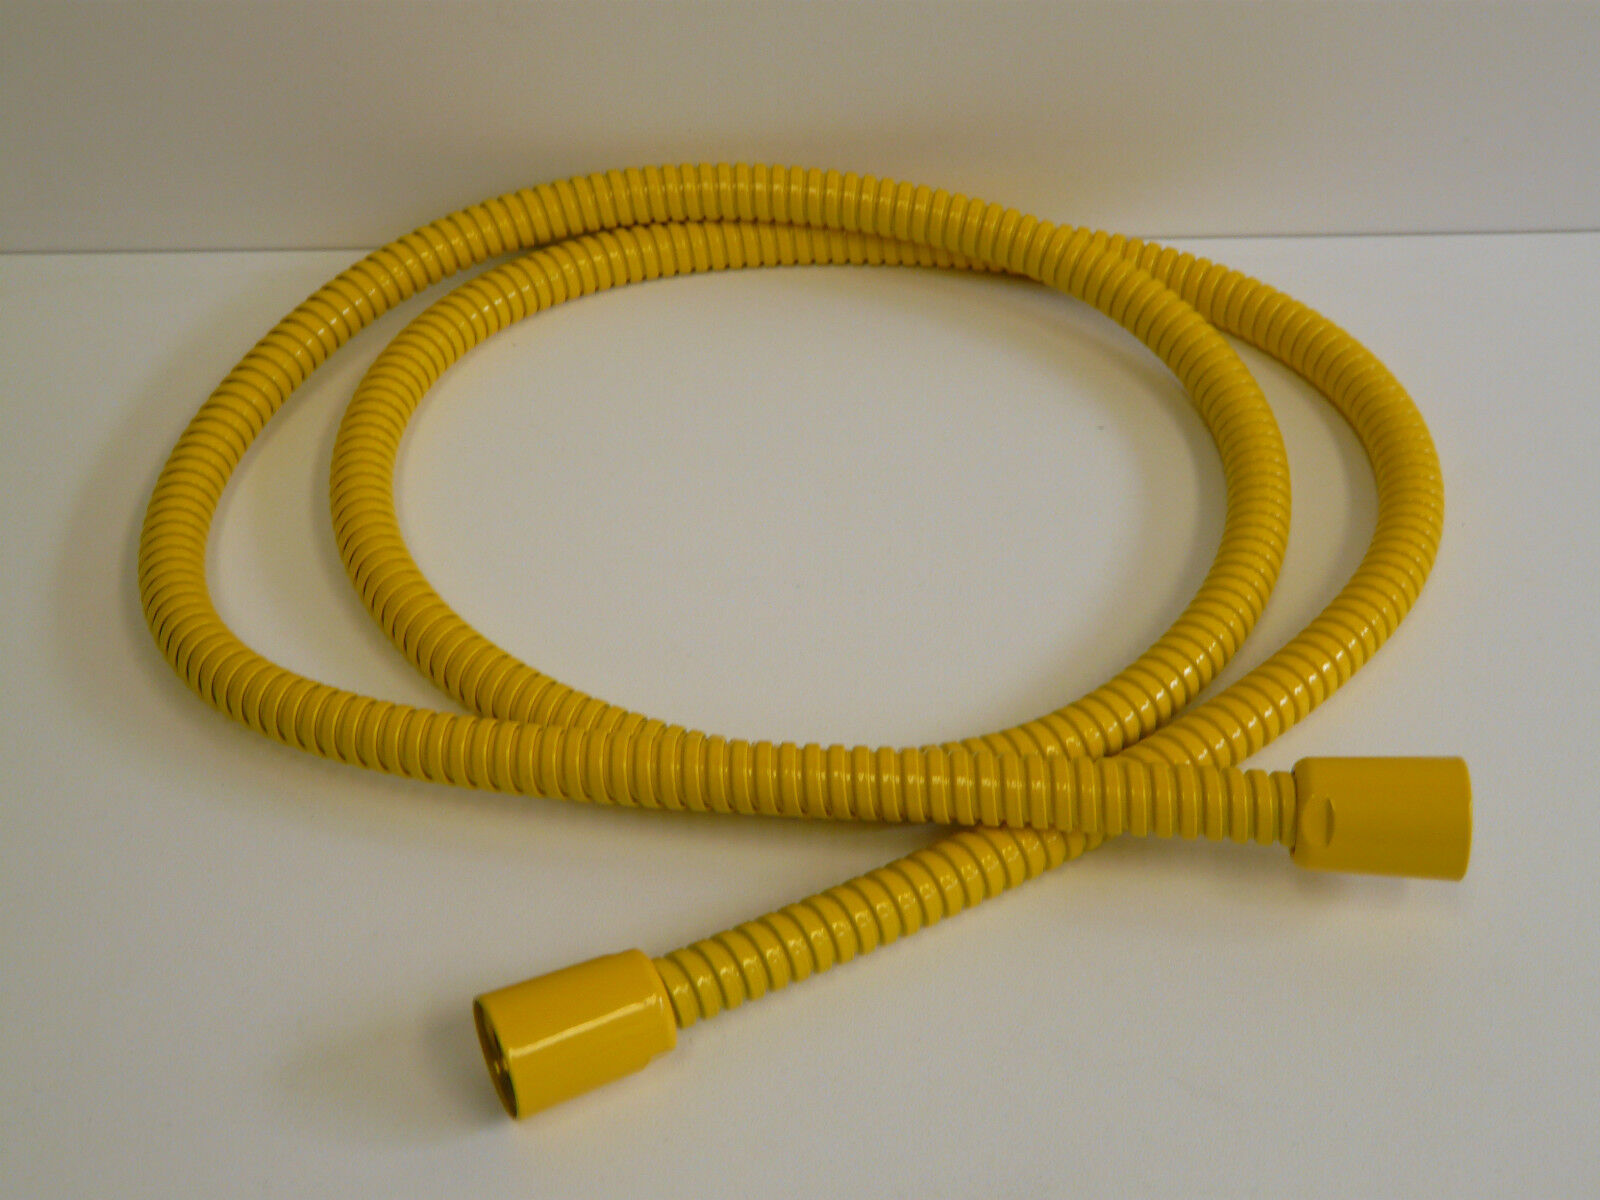 Tubo Doccia Metallo Giallo (Ral 1023), Flessibile in Metallo, a Mano